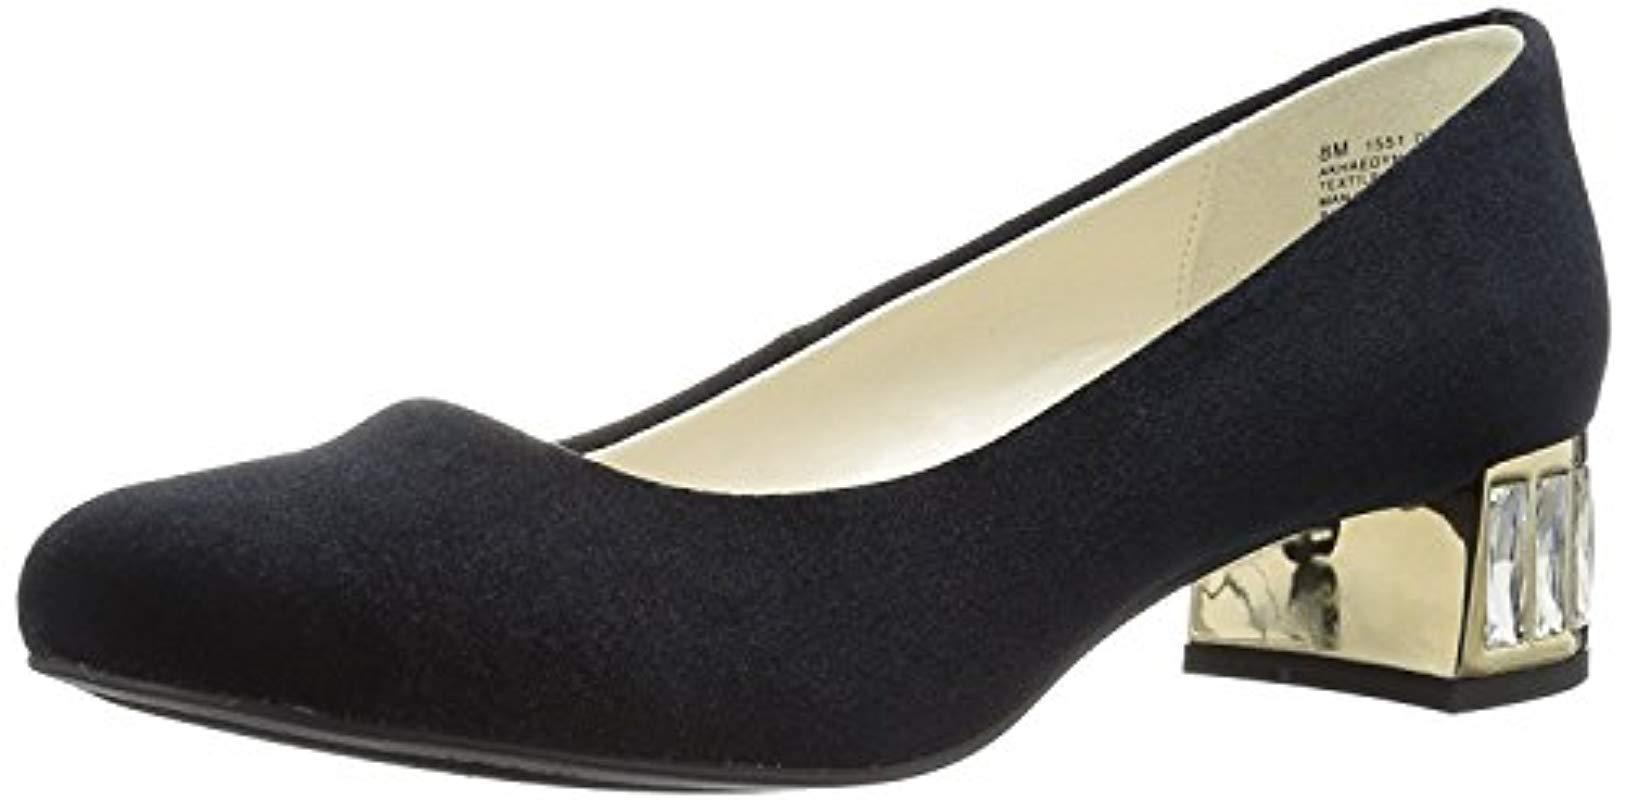 96752bcefd1 Lyst - Anne Klein Haedyn Fabric Dress Pump in Black - Save 53%